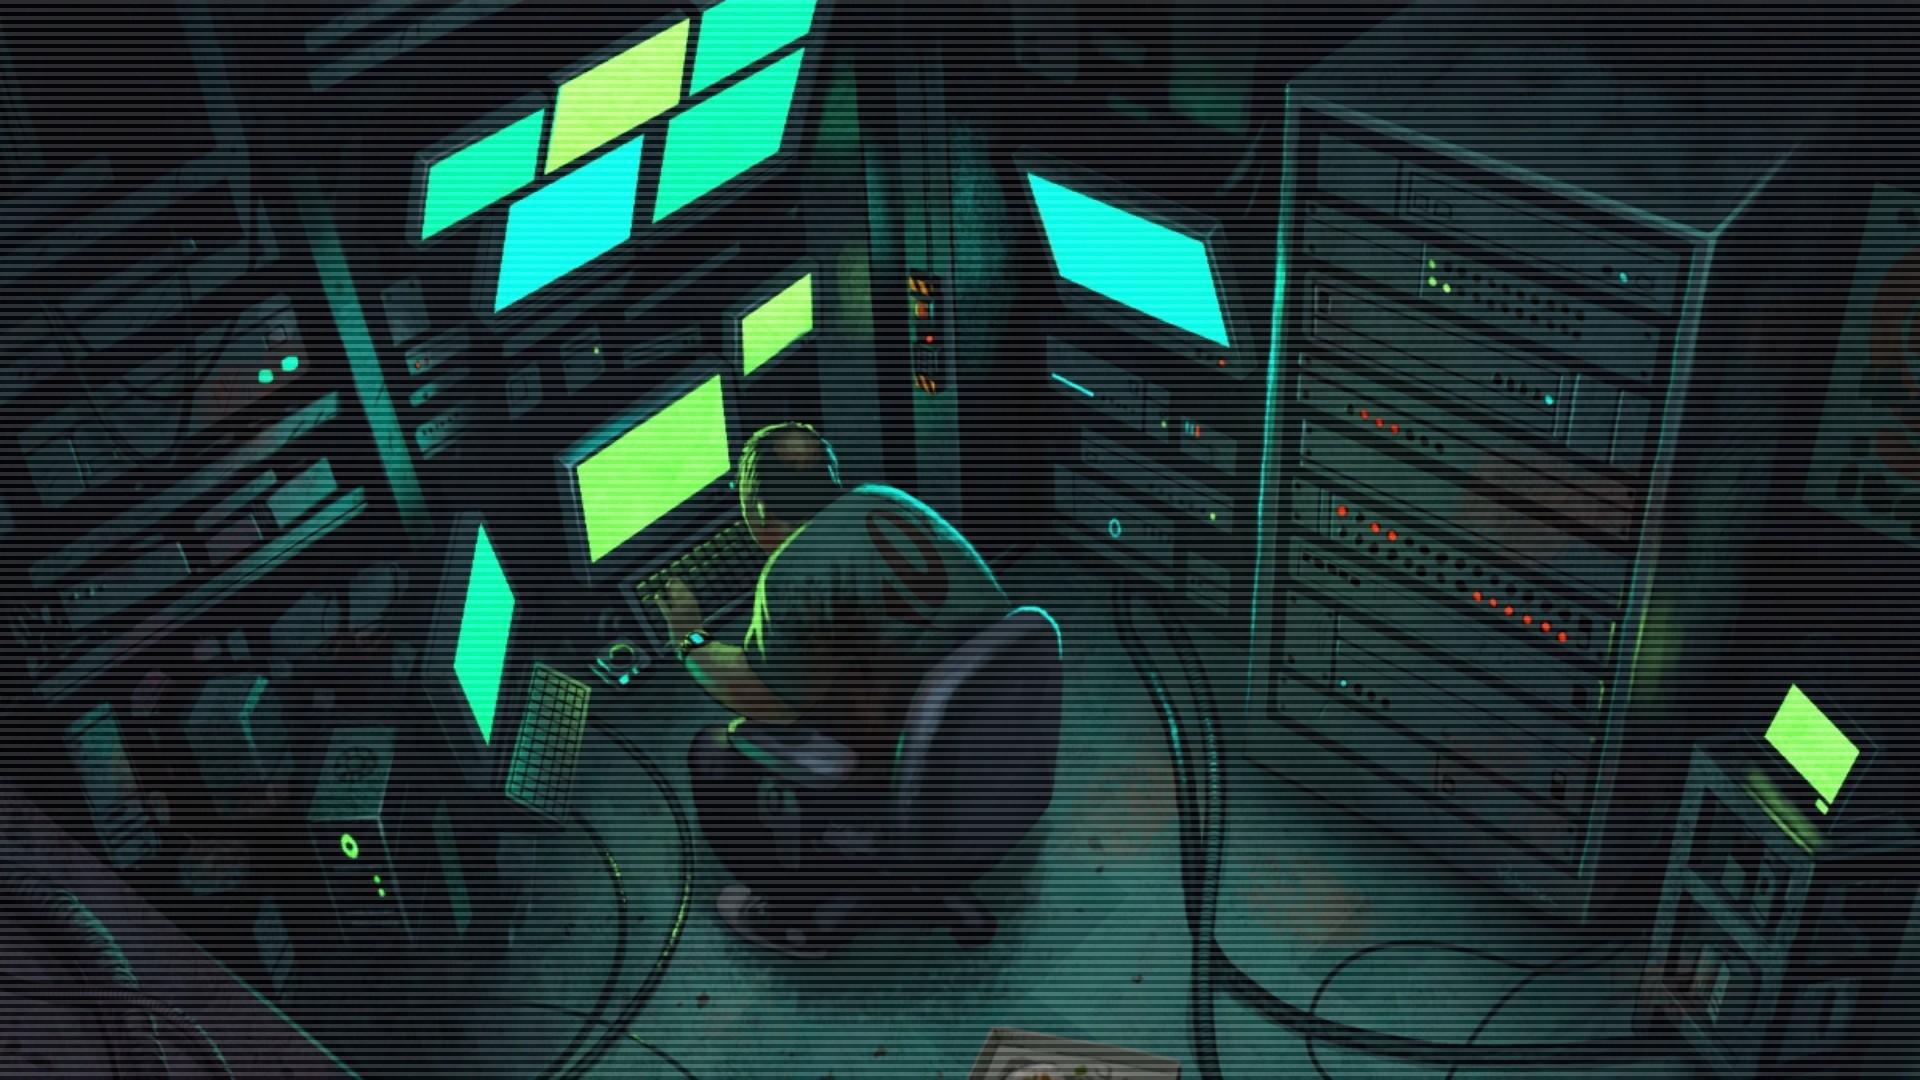 Hacker Wallpaper for pc